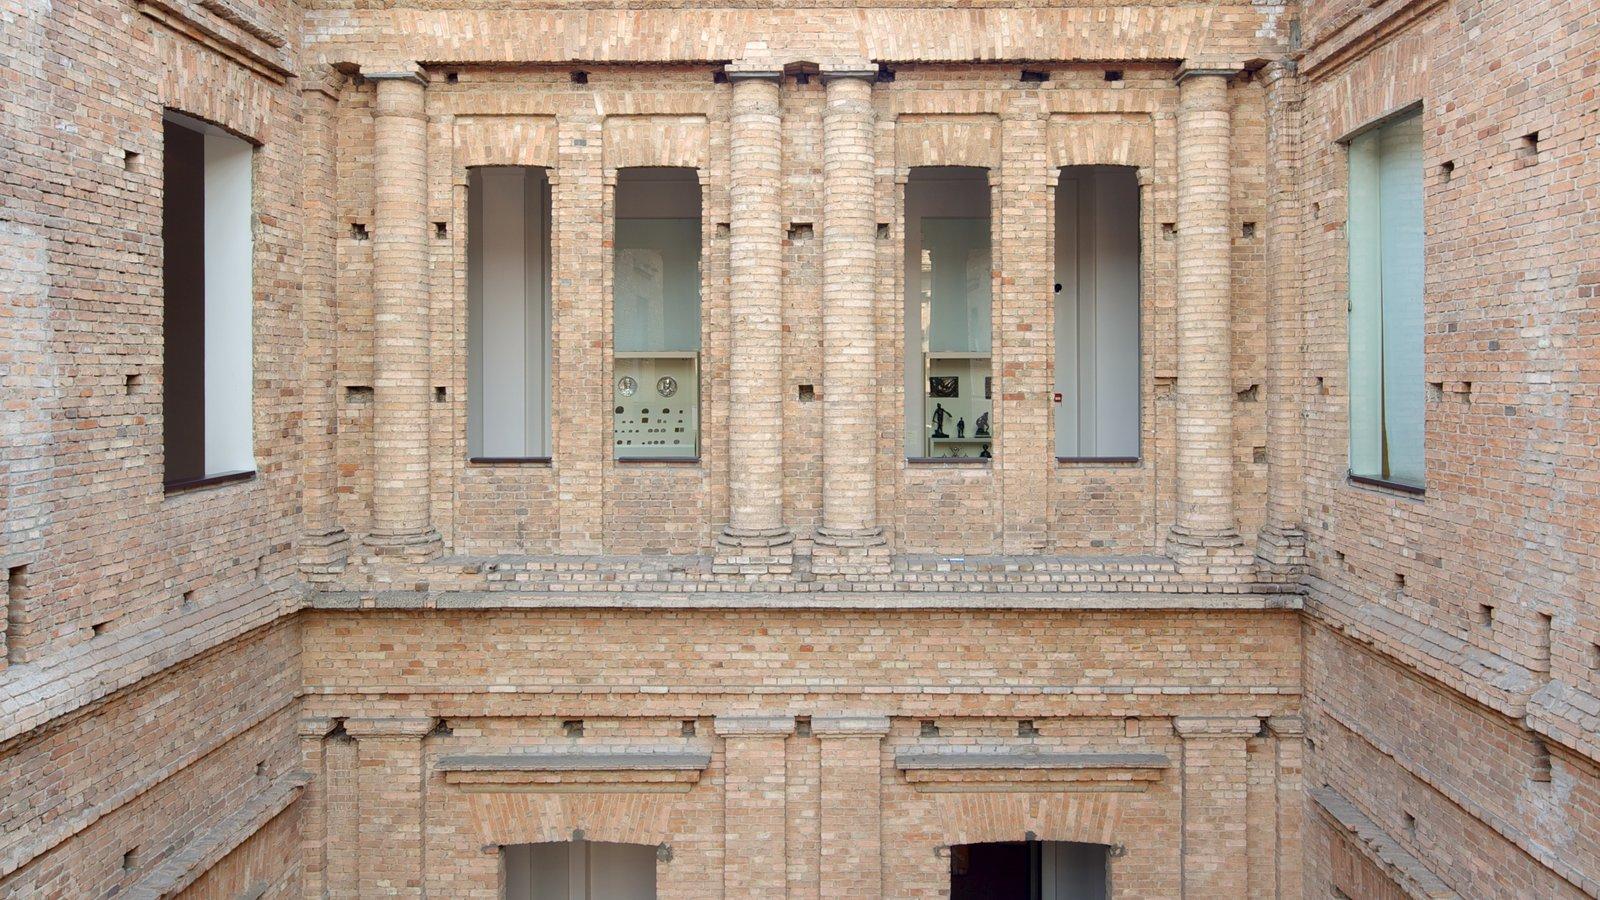 Pinacoteca do Estado caracterizando arquitetura de patrimônio